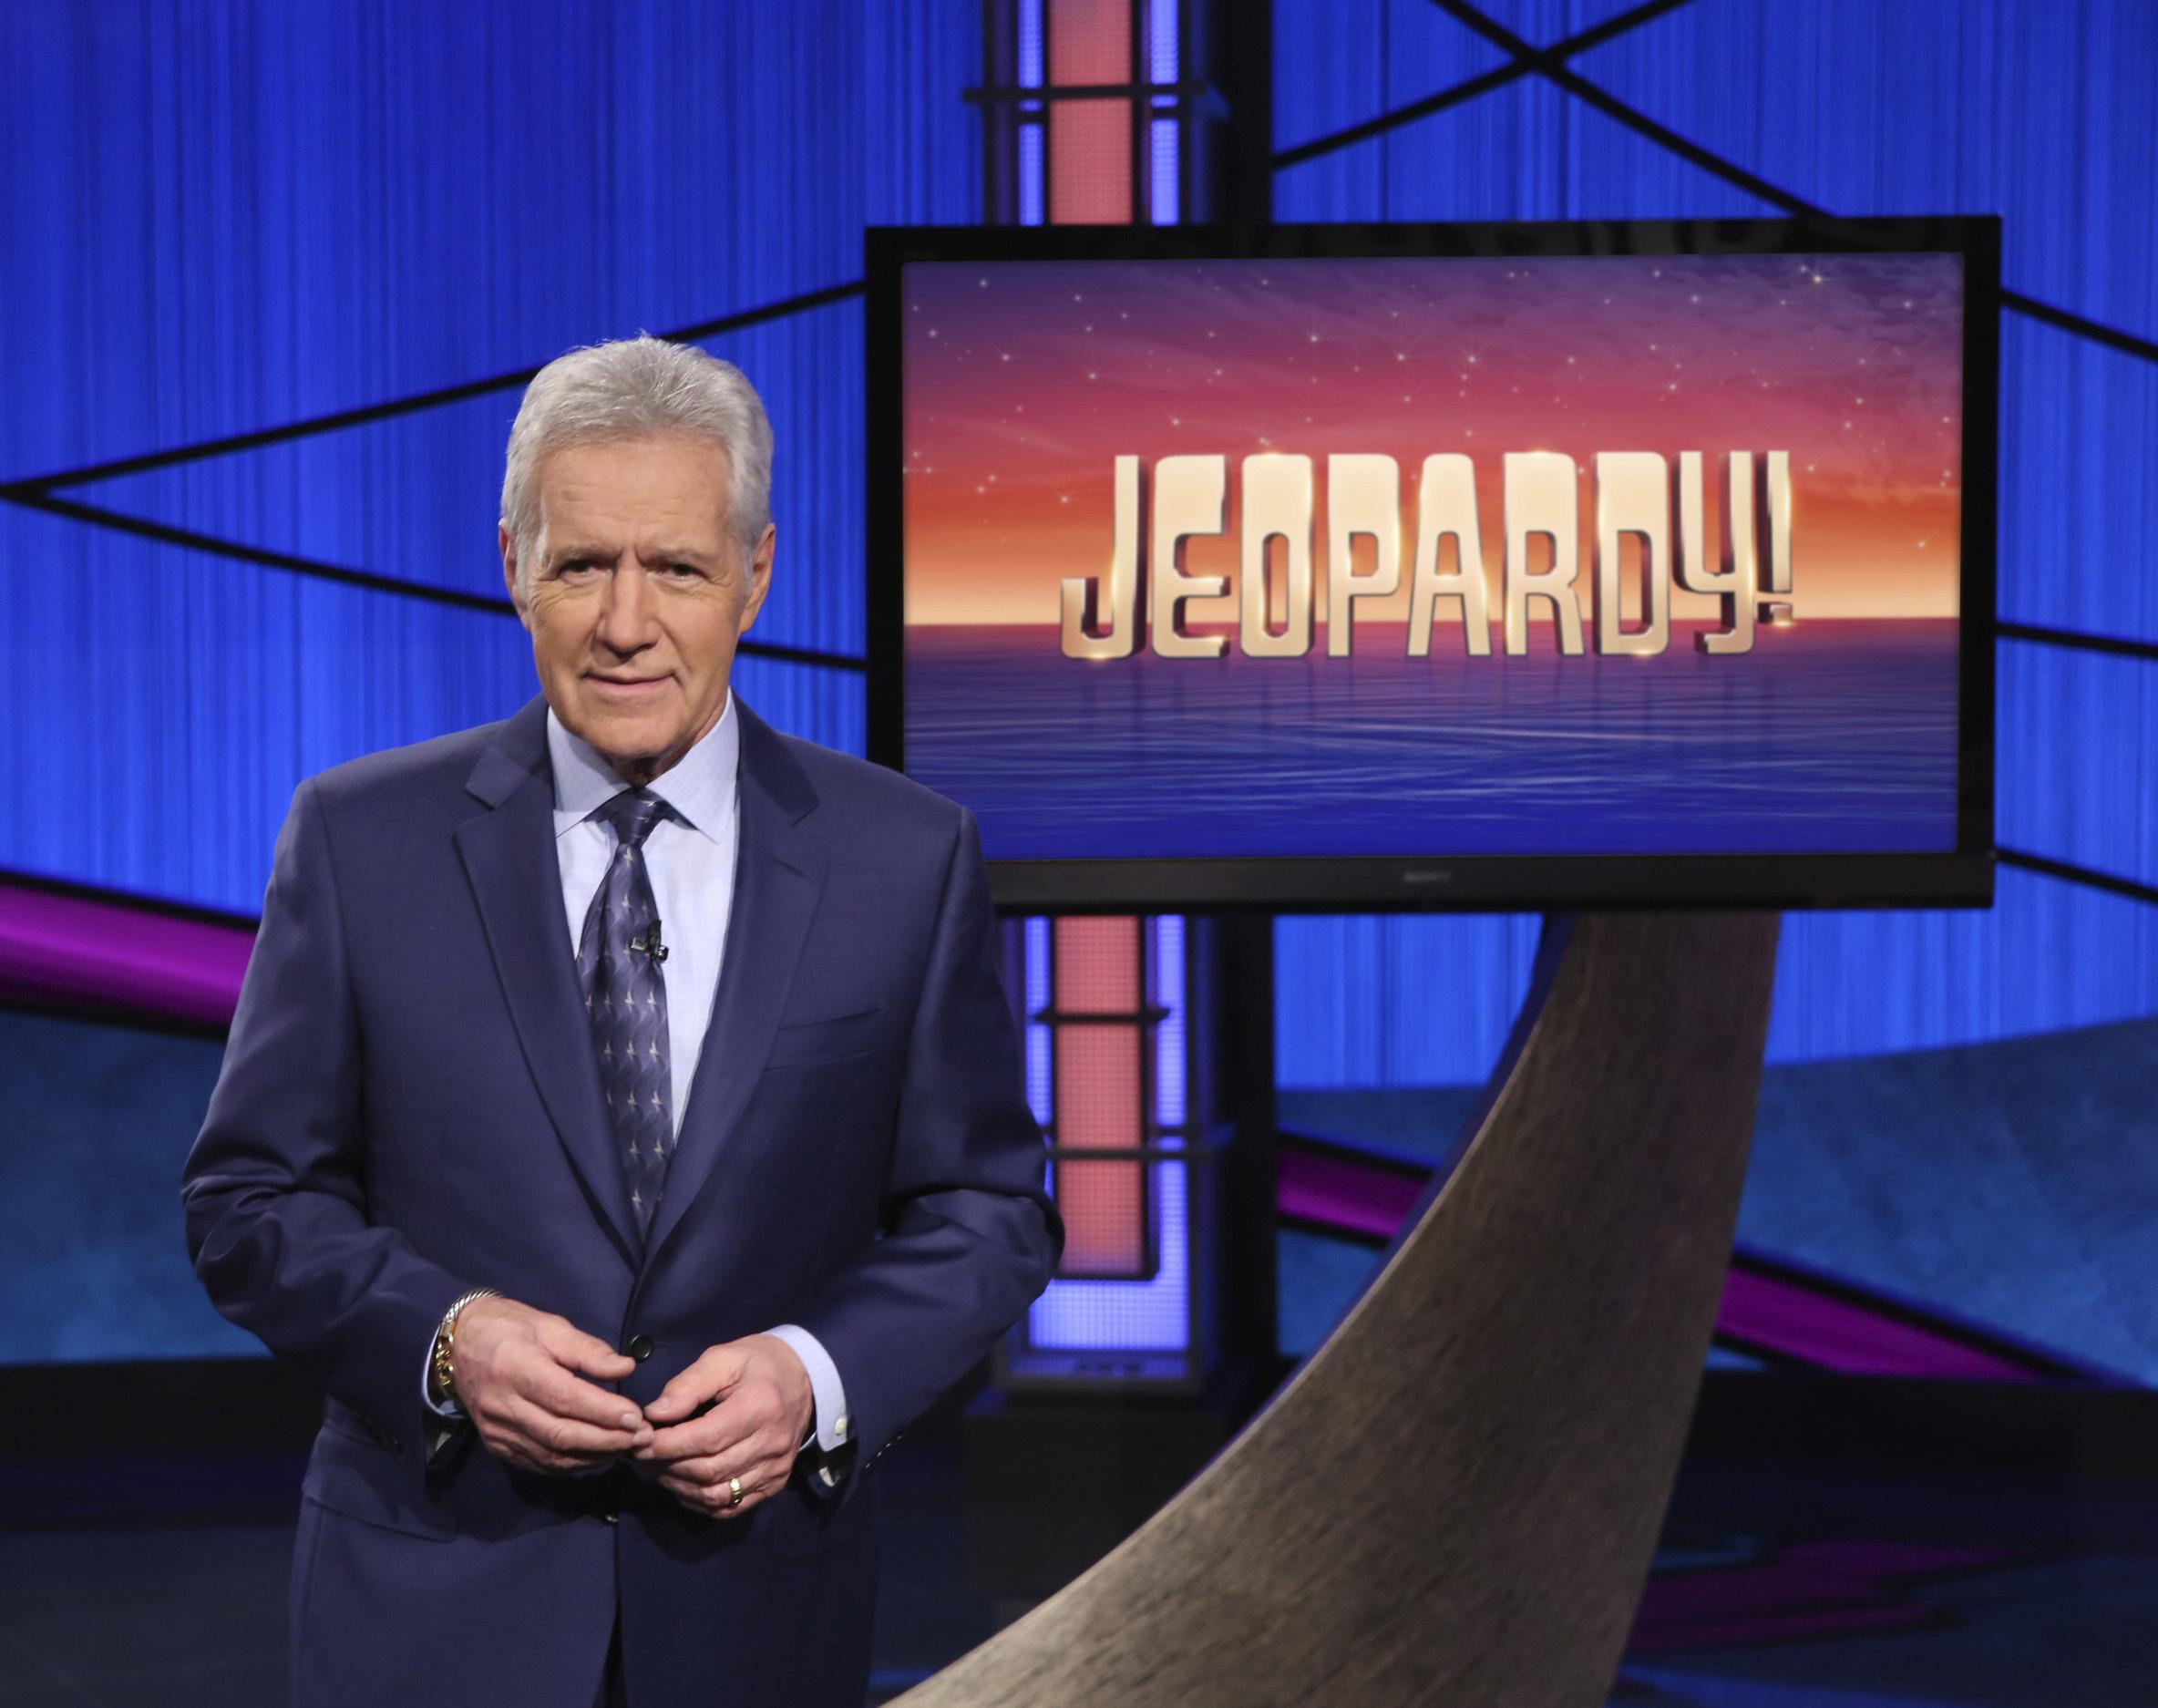 Many pay tribute to late 'Jeopardy' host Alex Trebek   The Boston ...